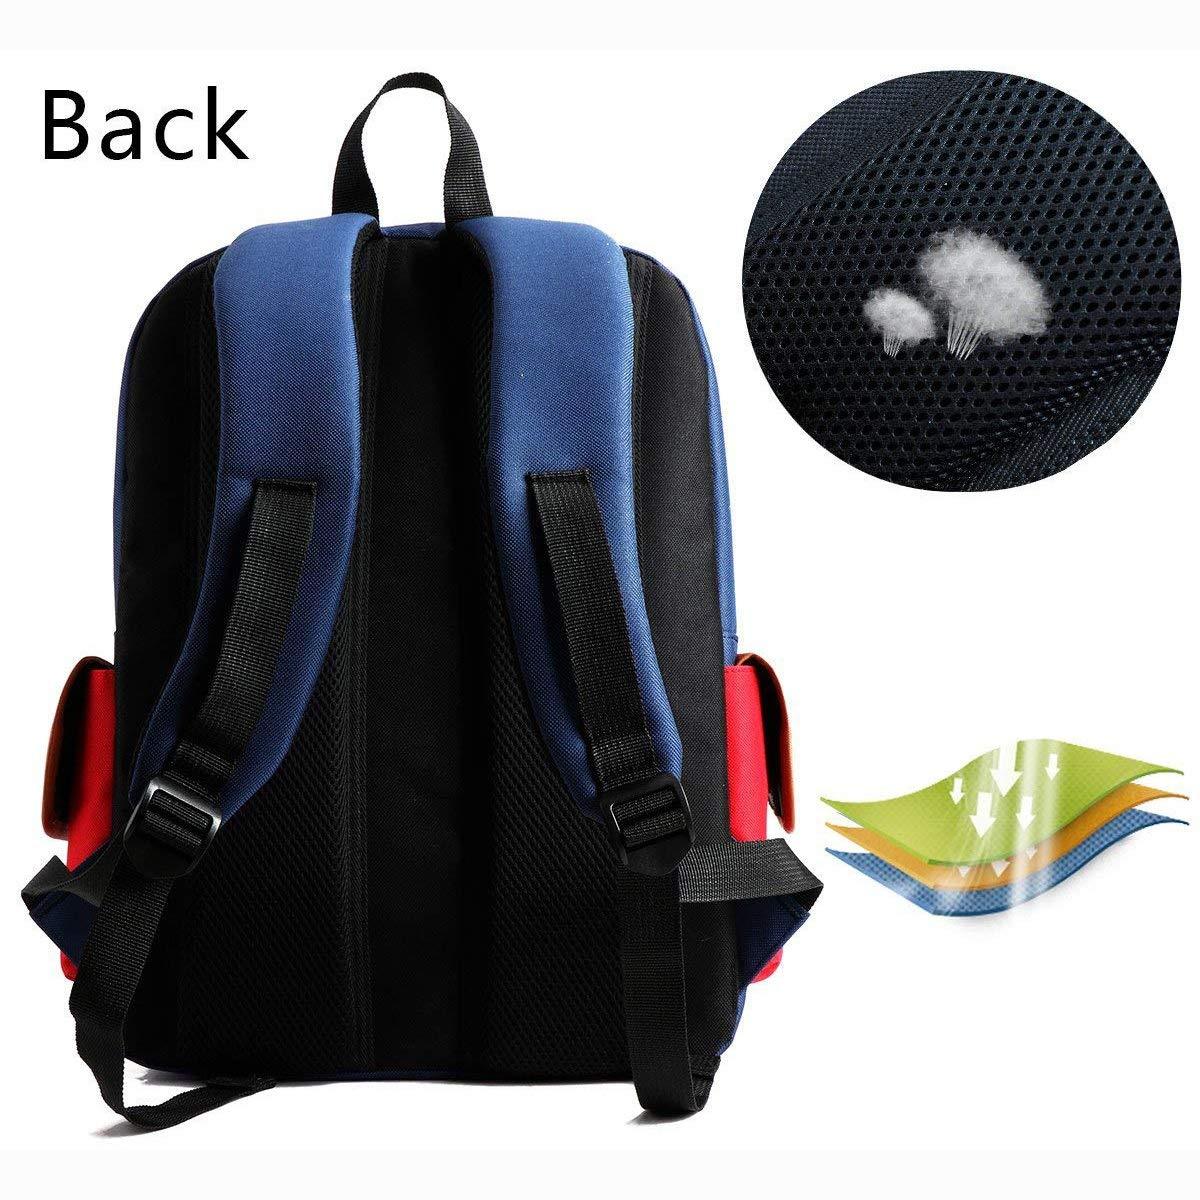 478c238fd9d4 Amazon.com: FULONG Kids Backpack Children School Bags Lightweight ...